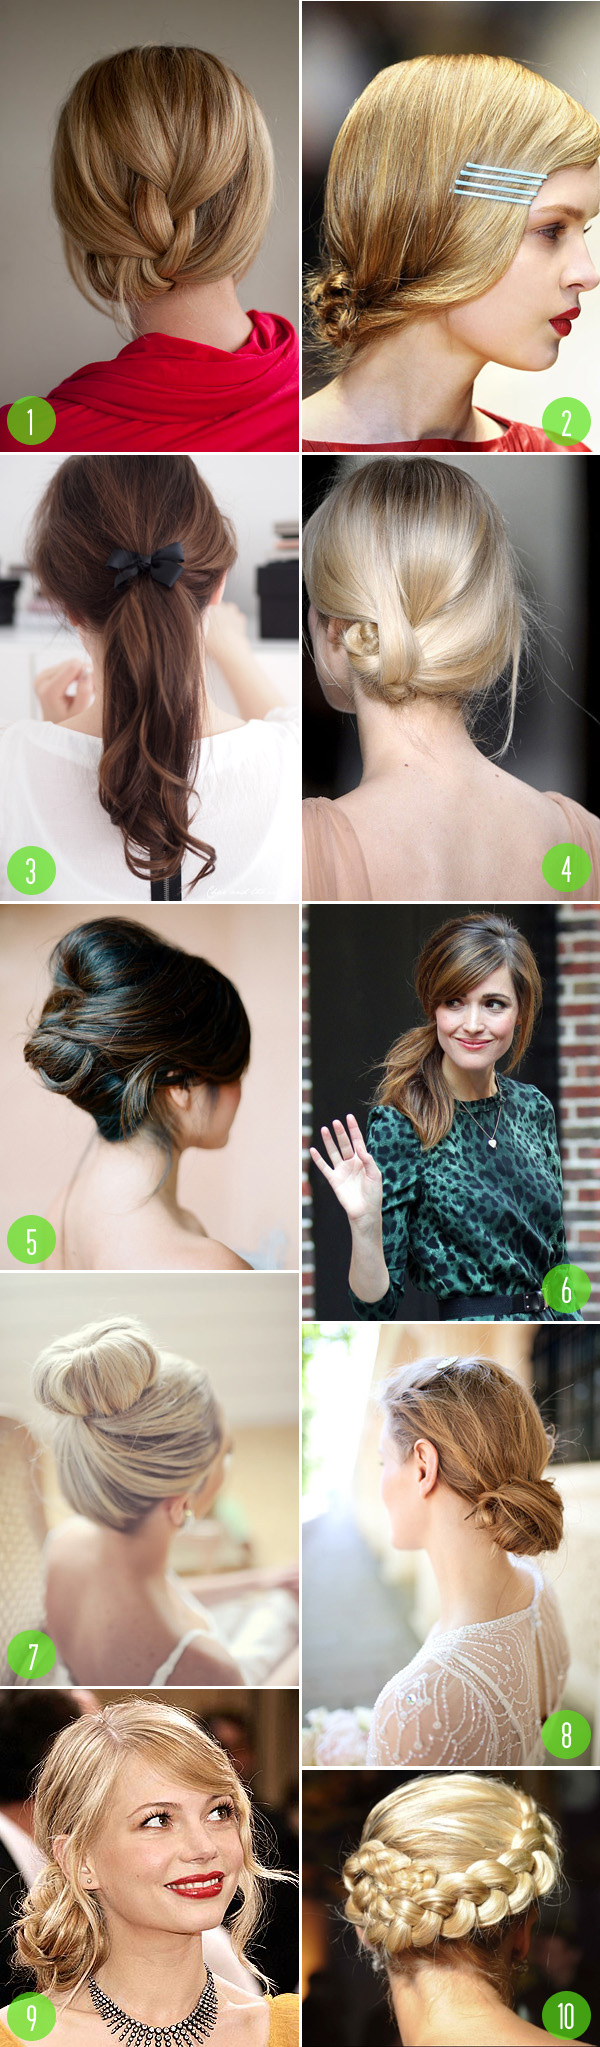 modern bridal hairstyle for weddings